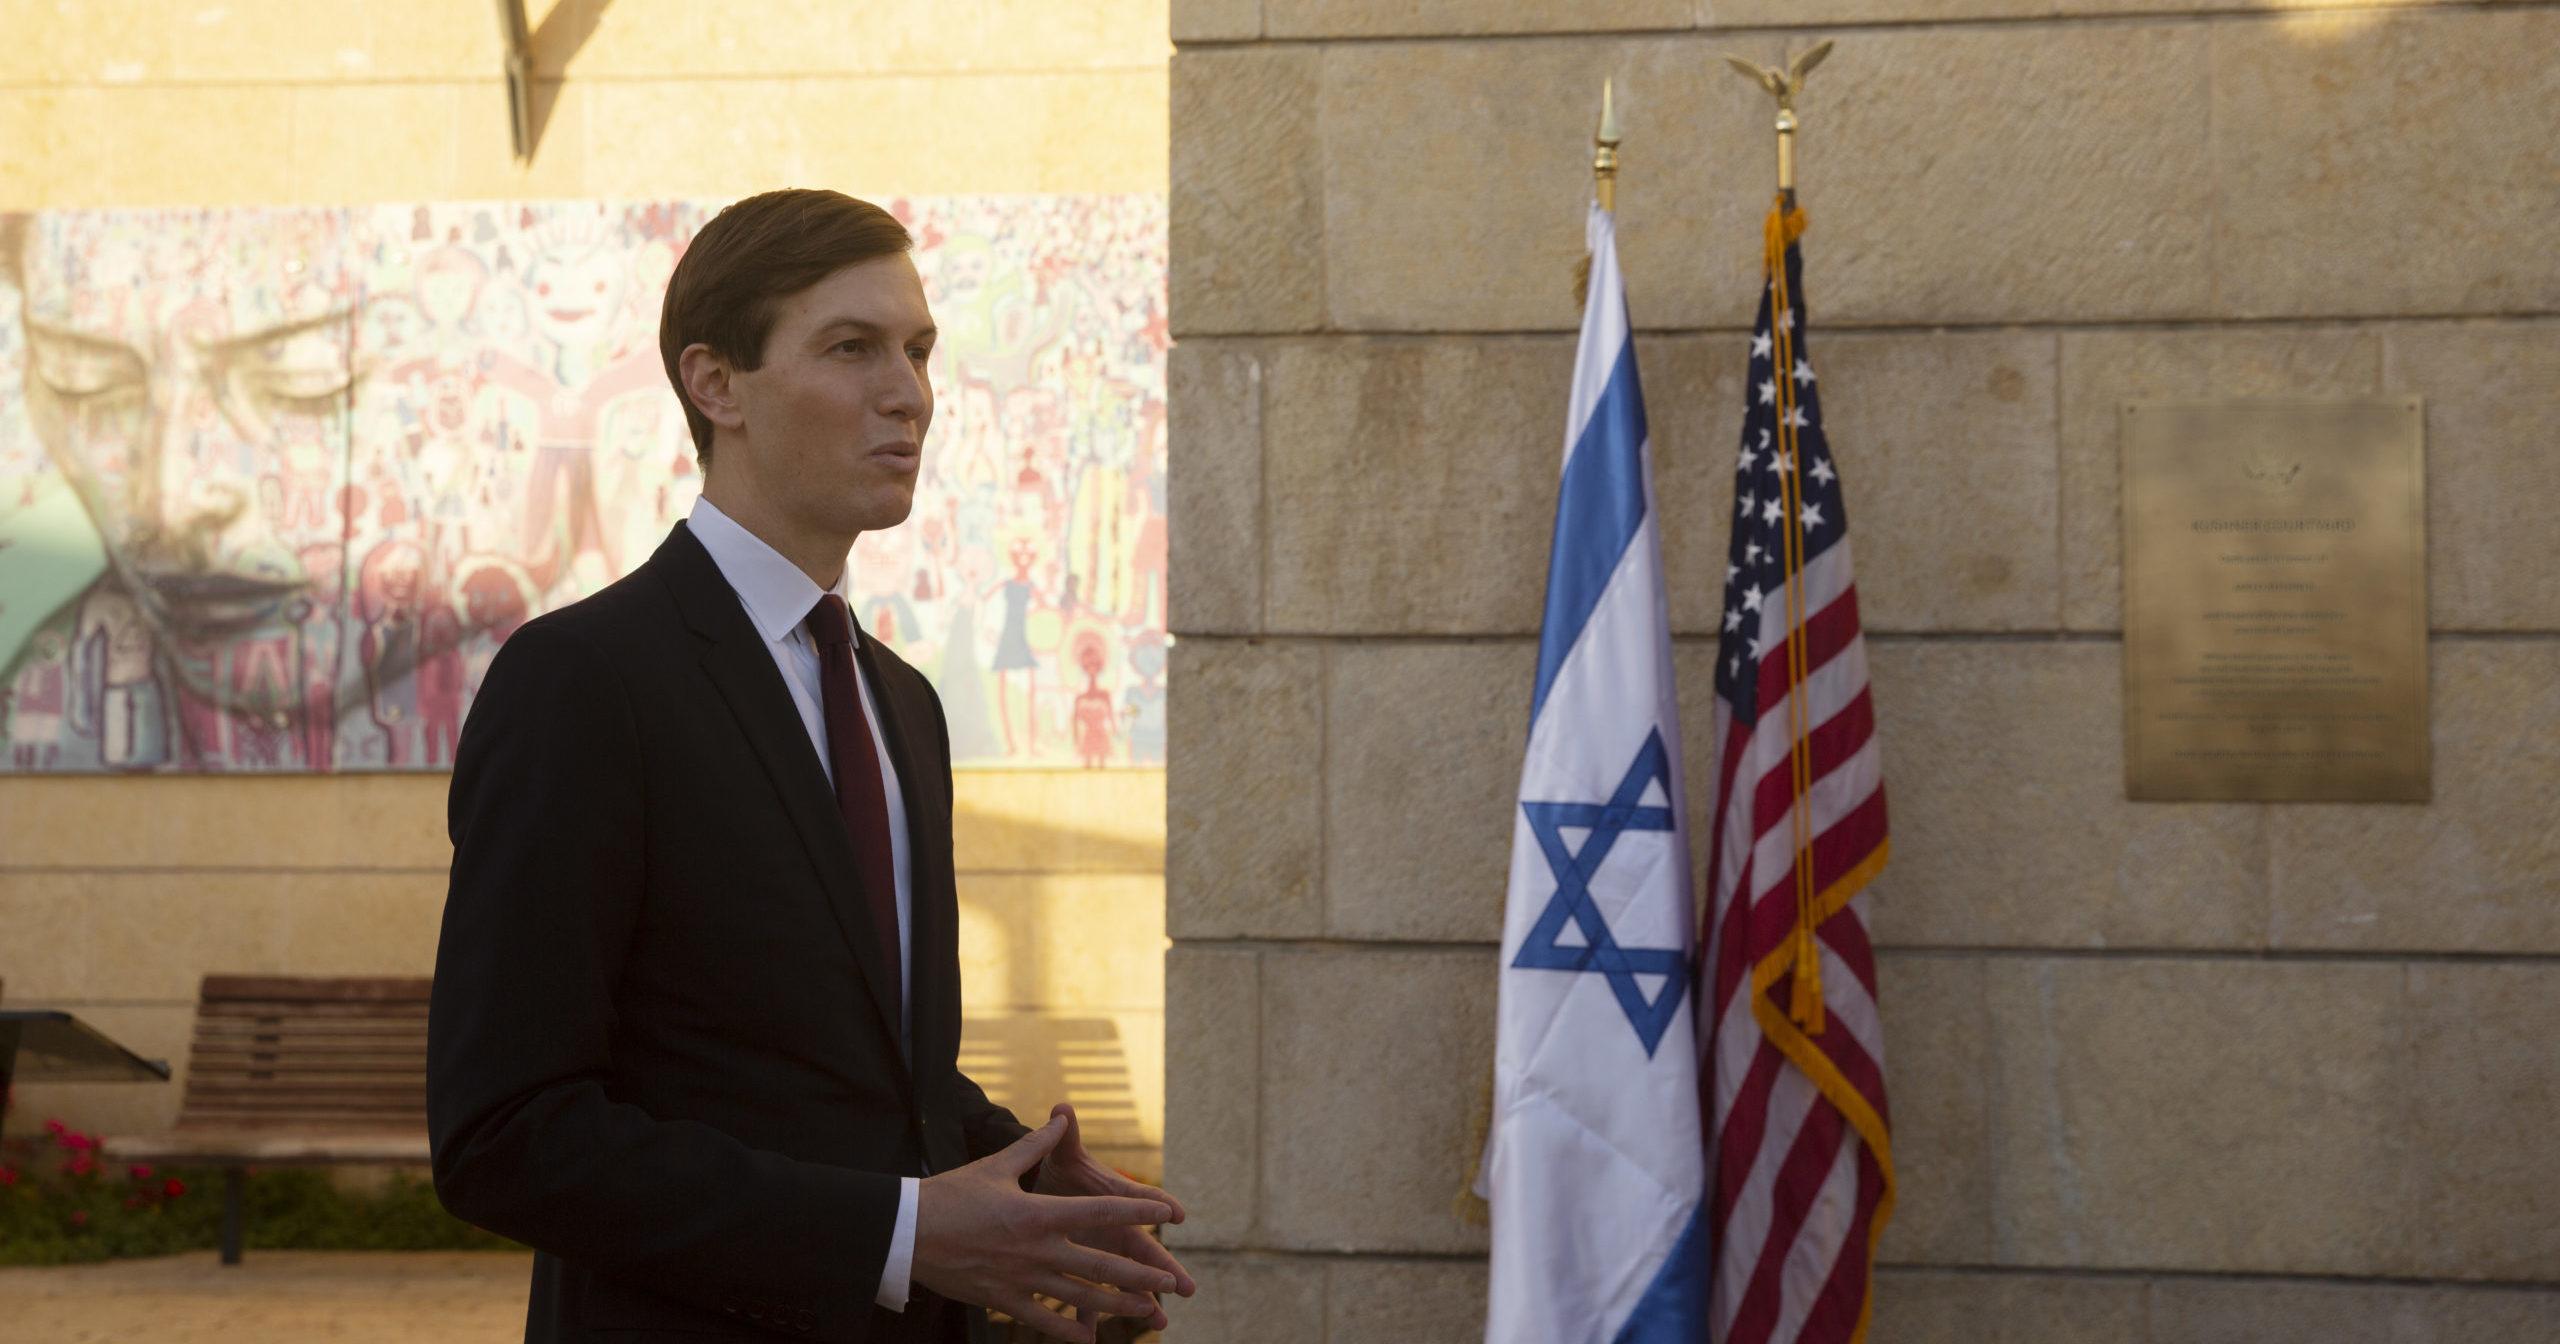 White House senior adviser Jared Kushner speaks to journalists after US Ambassador David Friedman unveiled a plaque at the US Embassy in Israel designating the Kushner Courtyard on Dec. 21, 2020.